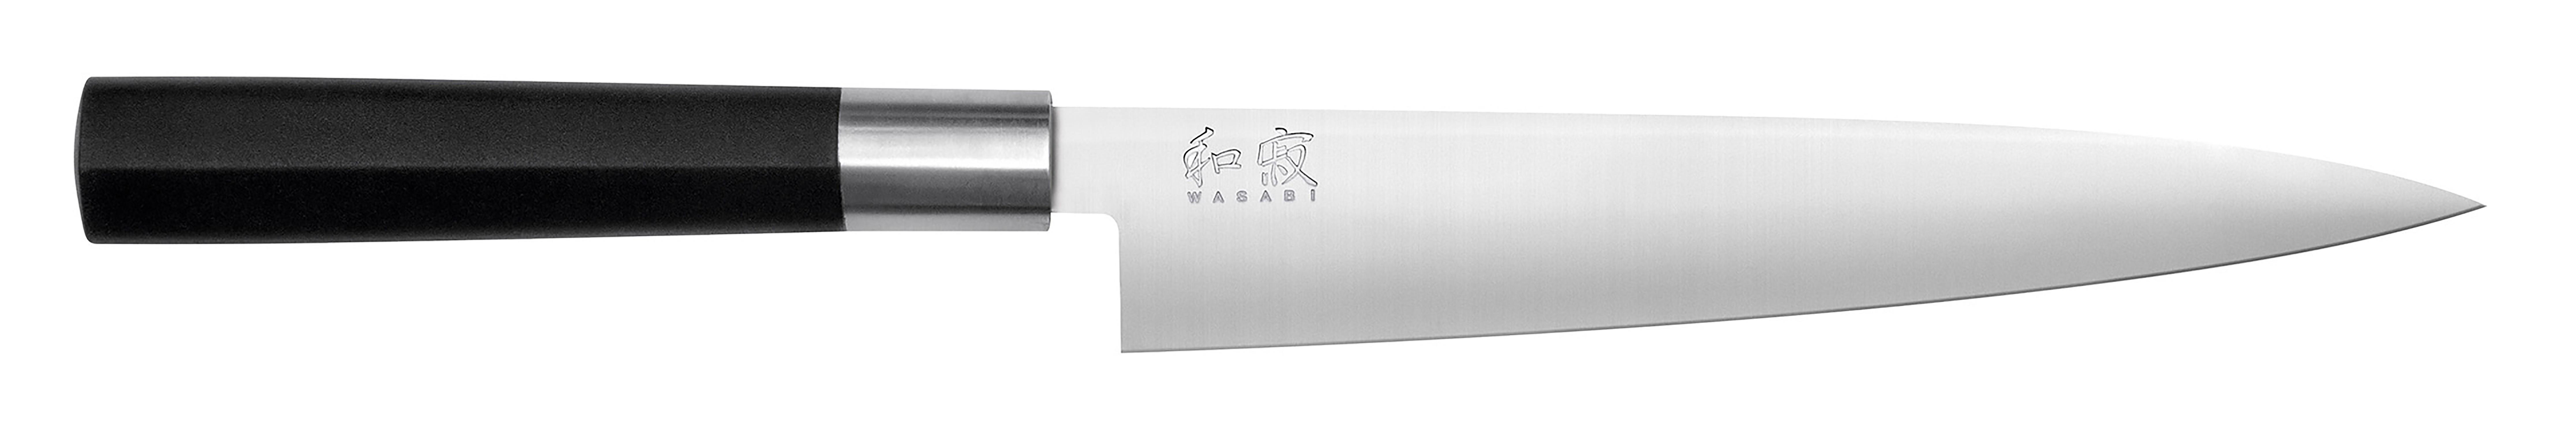 KAI WASABI BLACK flexibles Filiermesser 18cm